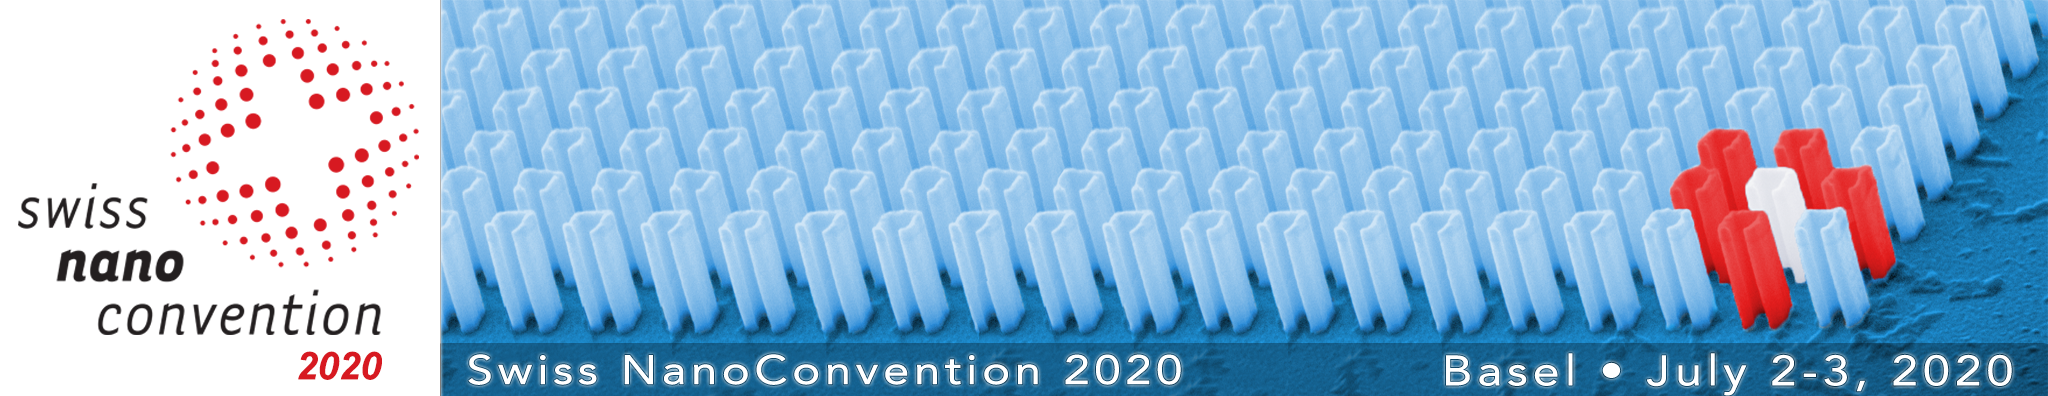 Swiss NanoConvention 2020